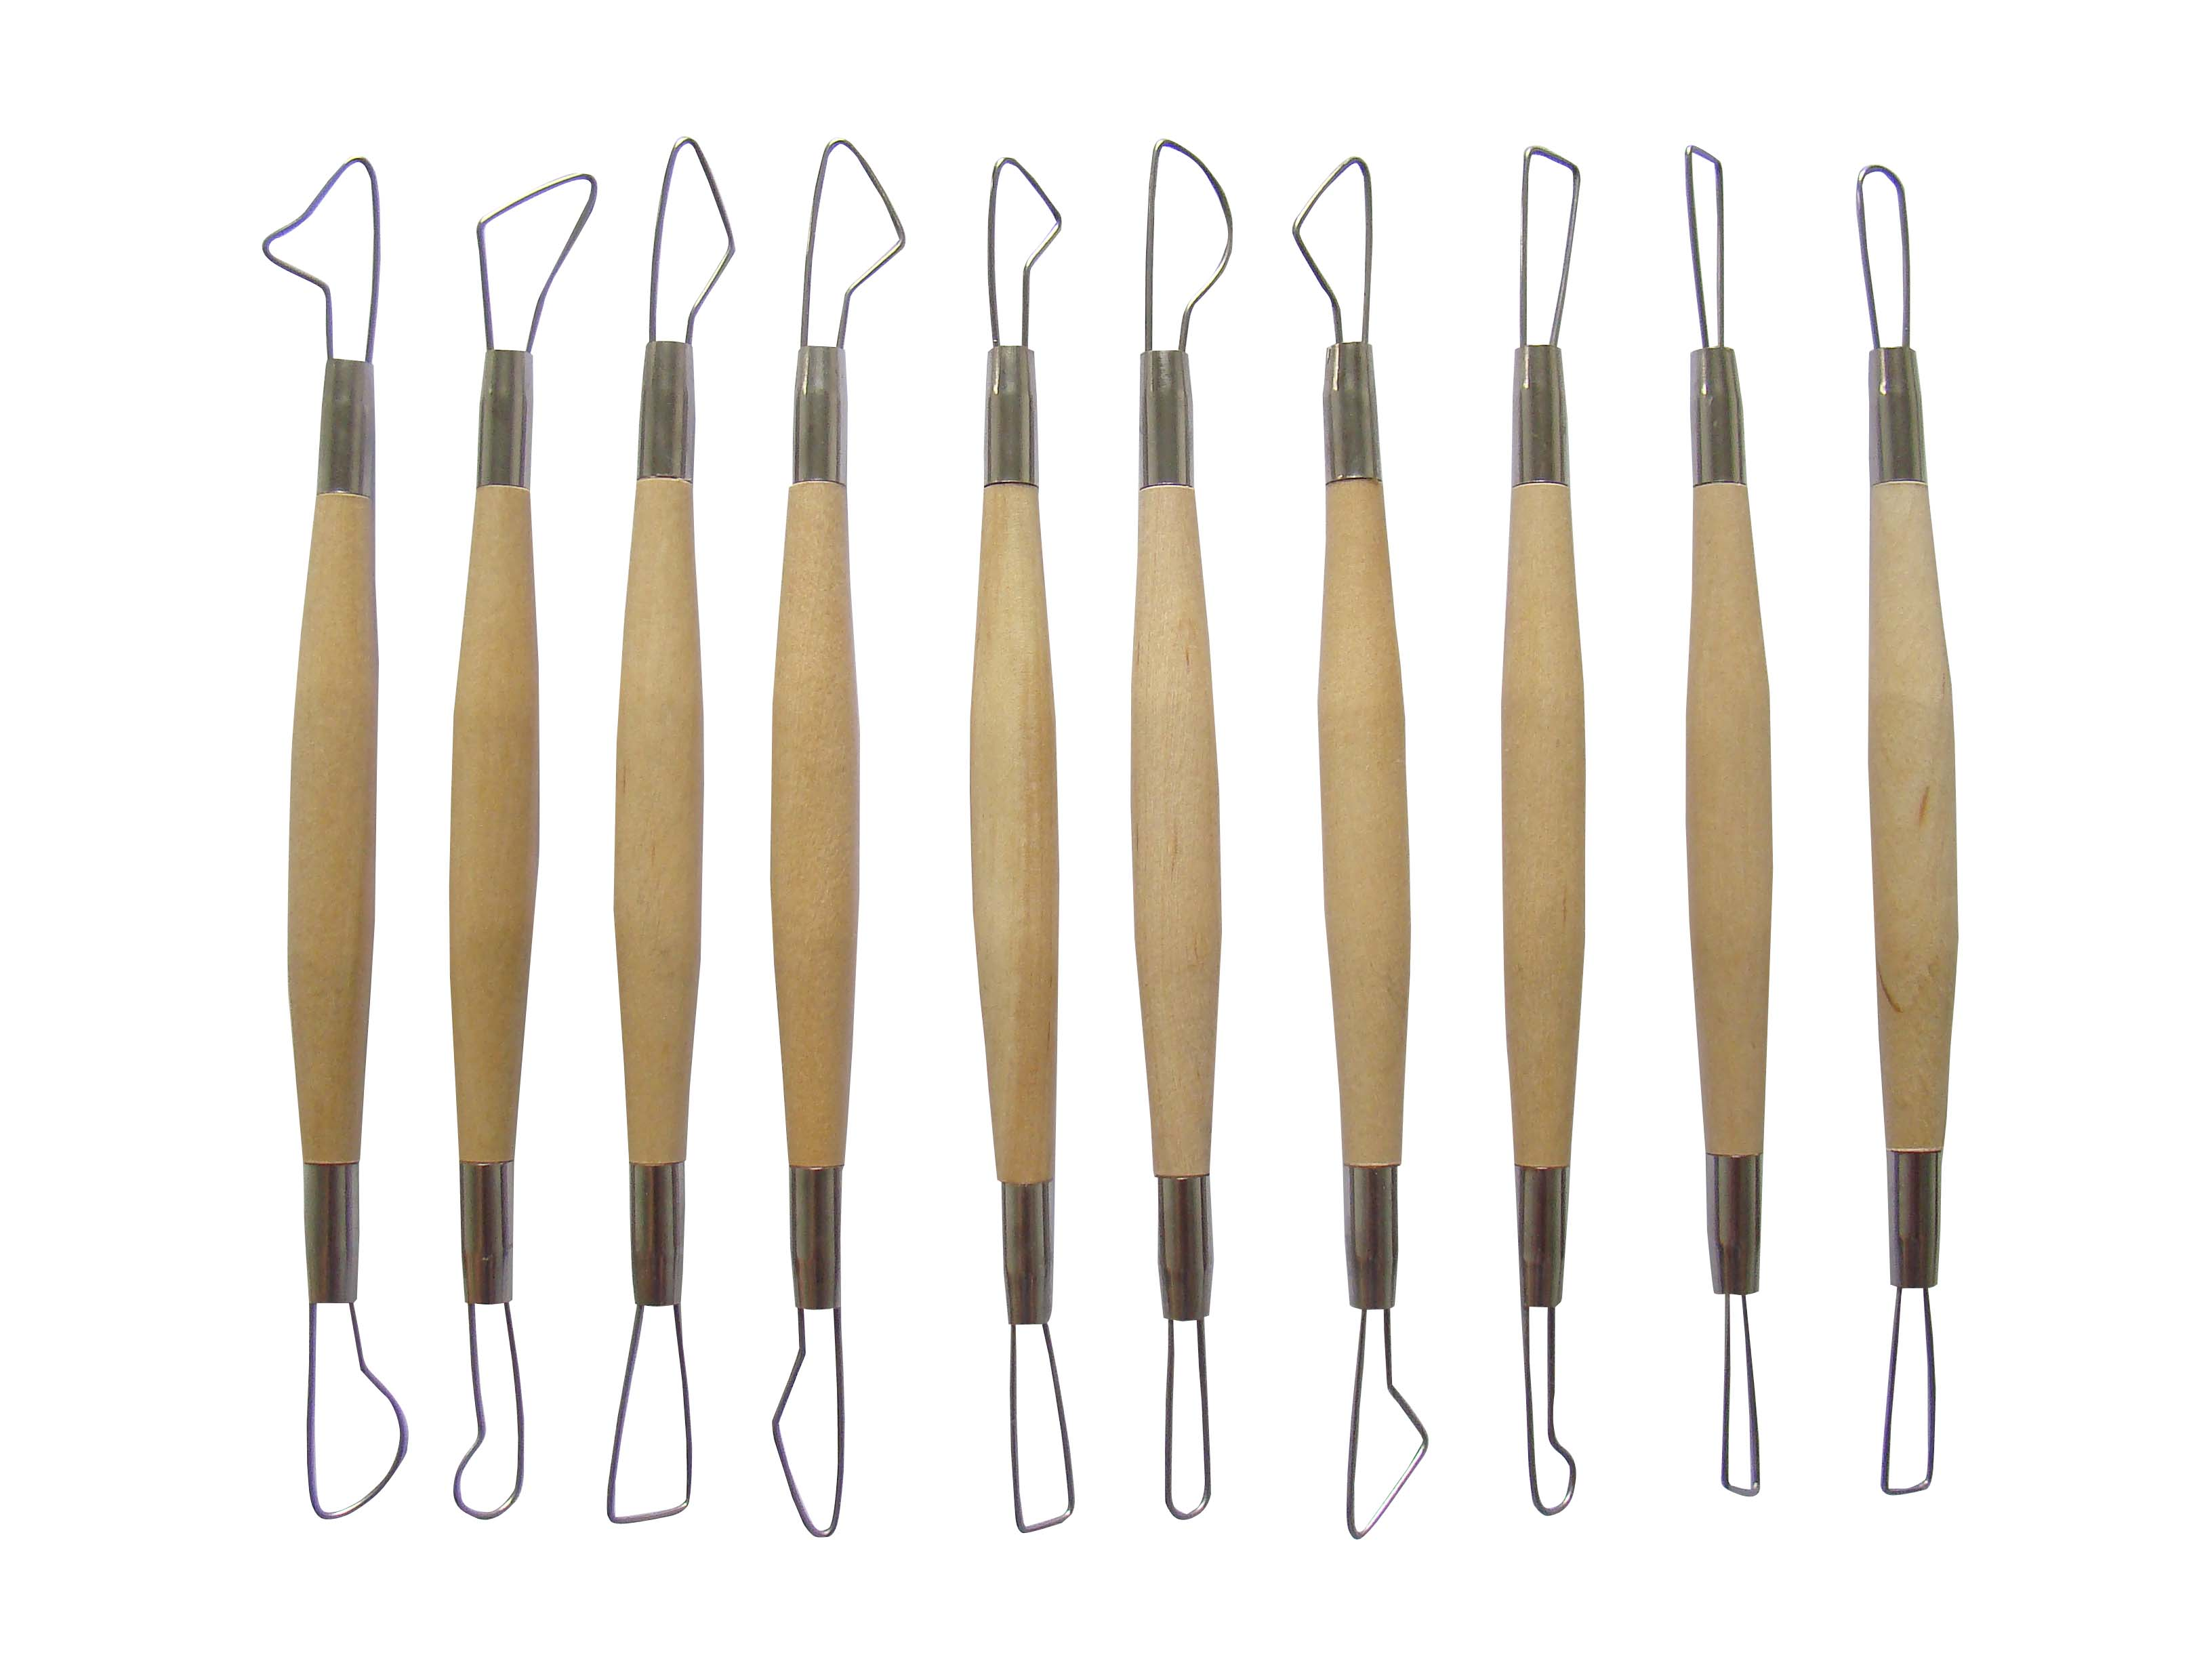 Art Advantage 7-Inch Double Wire End Tool Set